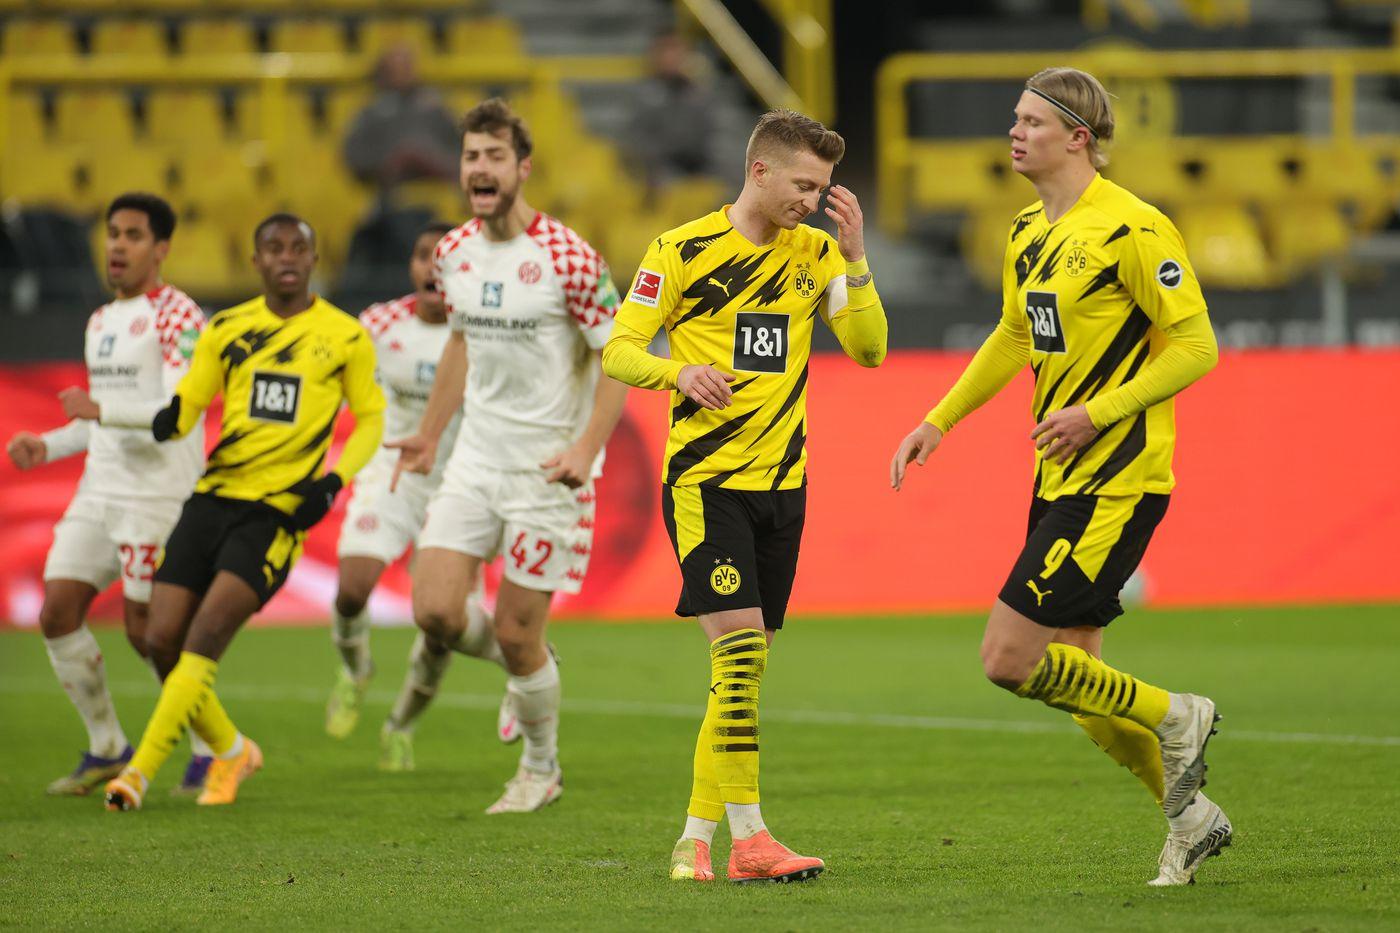 Borussia Dortmund vs Mainz prediction